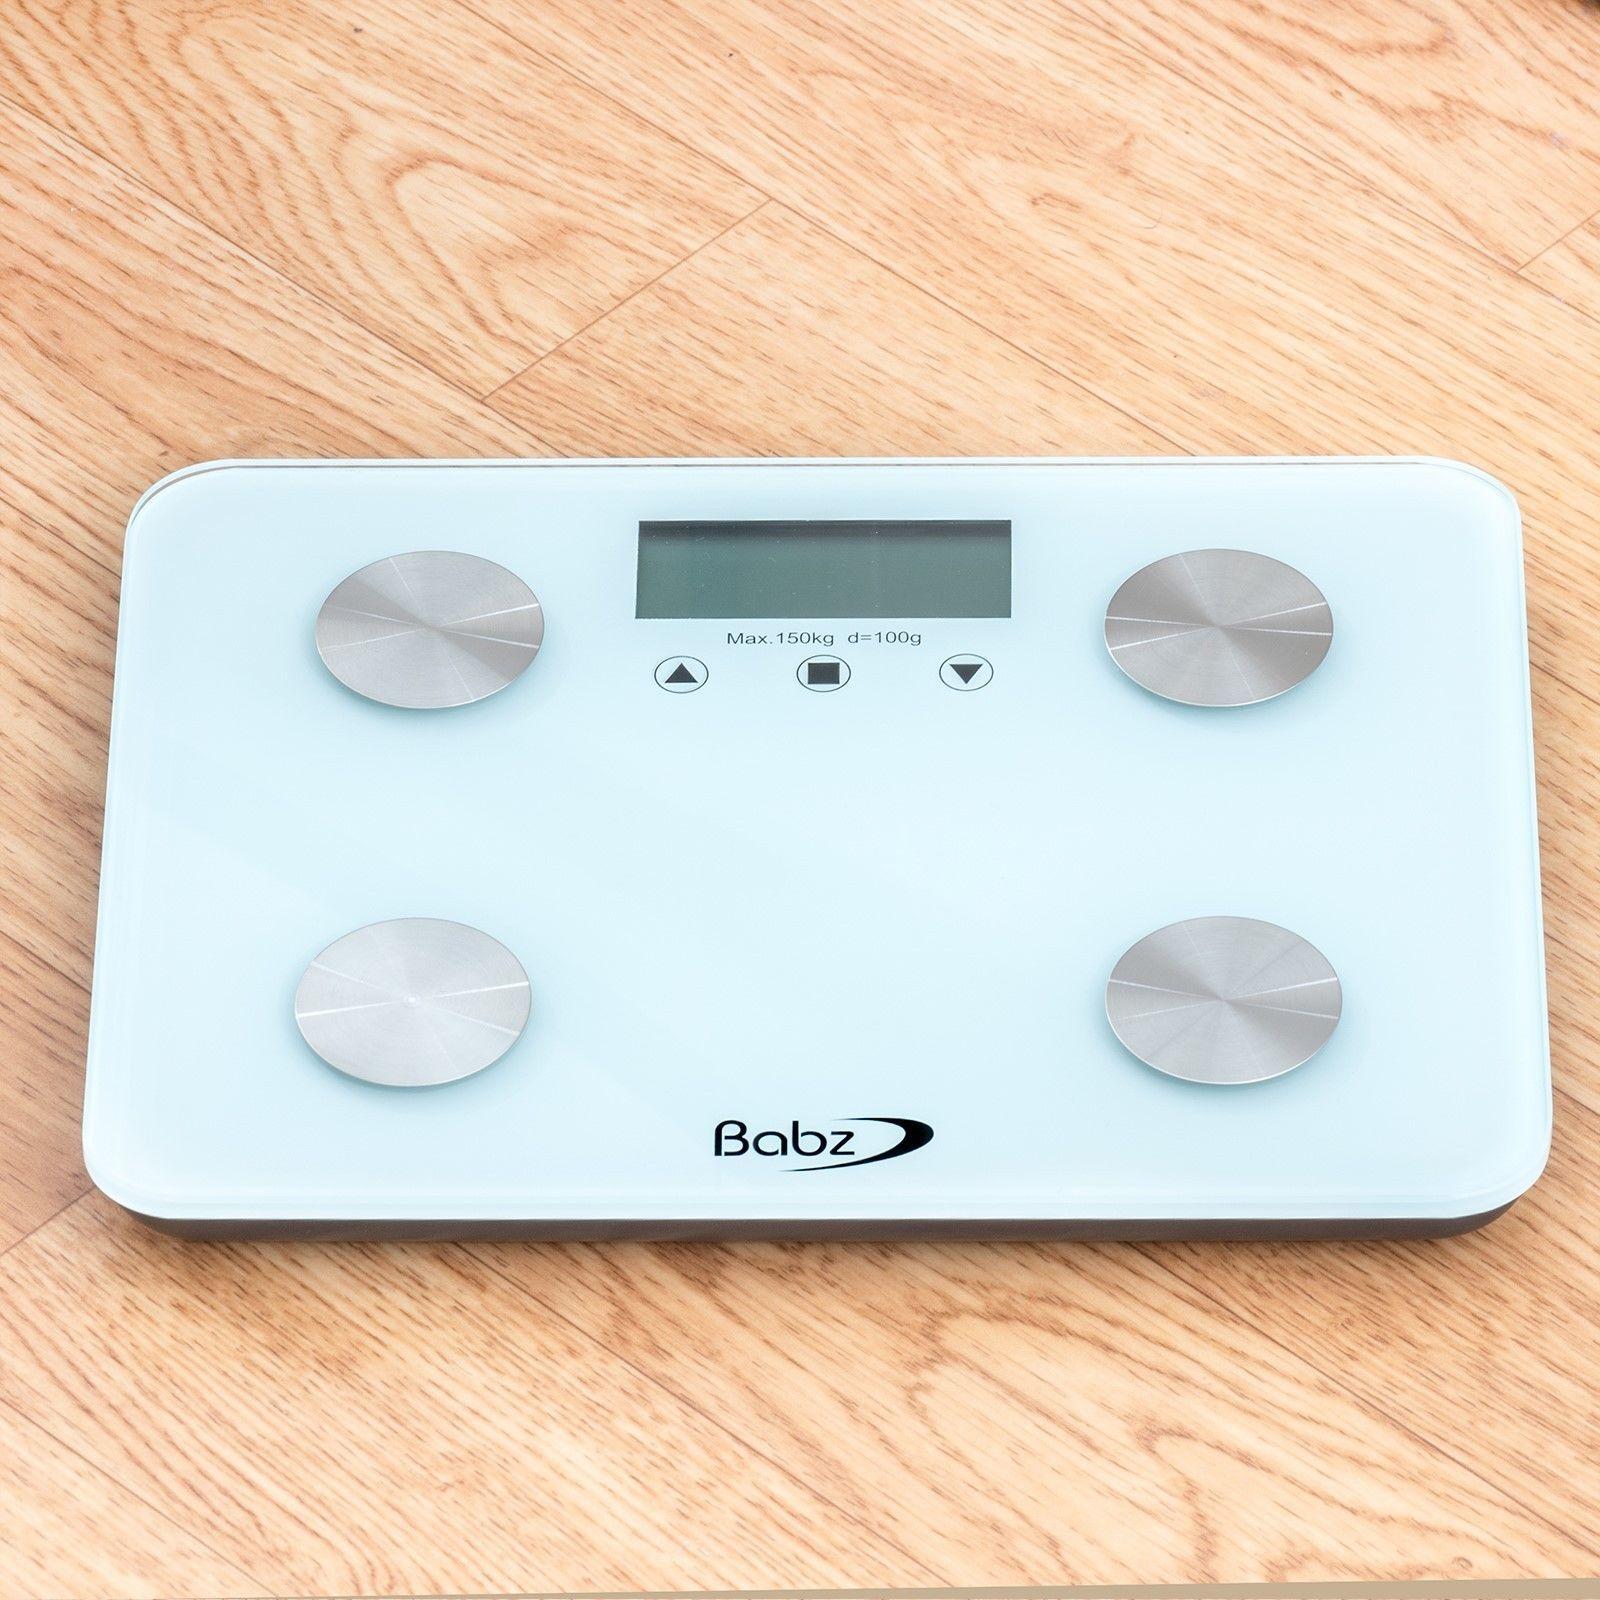 Bmi Bathroom Scale: Digital Body Fat BMI Analyser Scales 150KG Weighing Scale